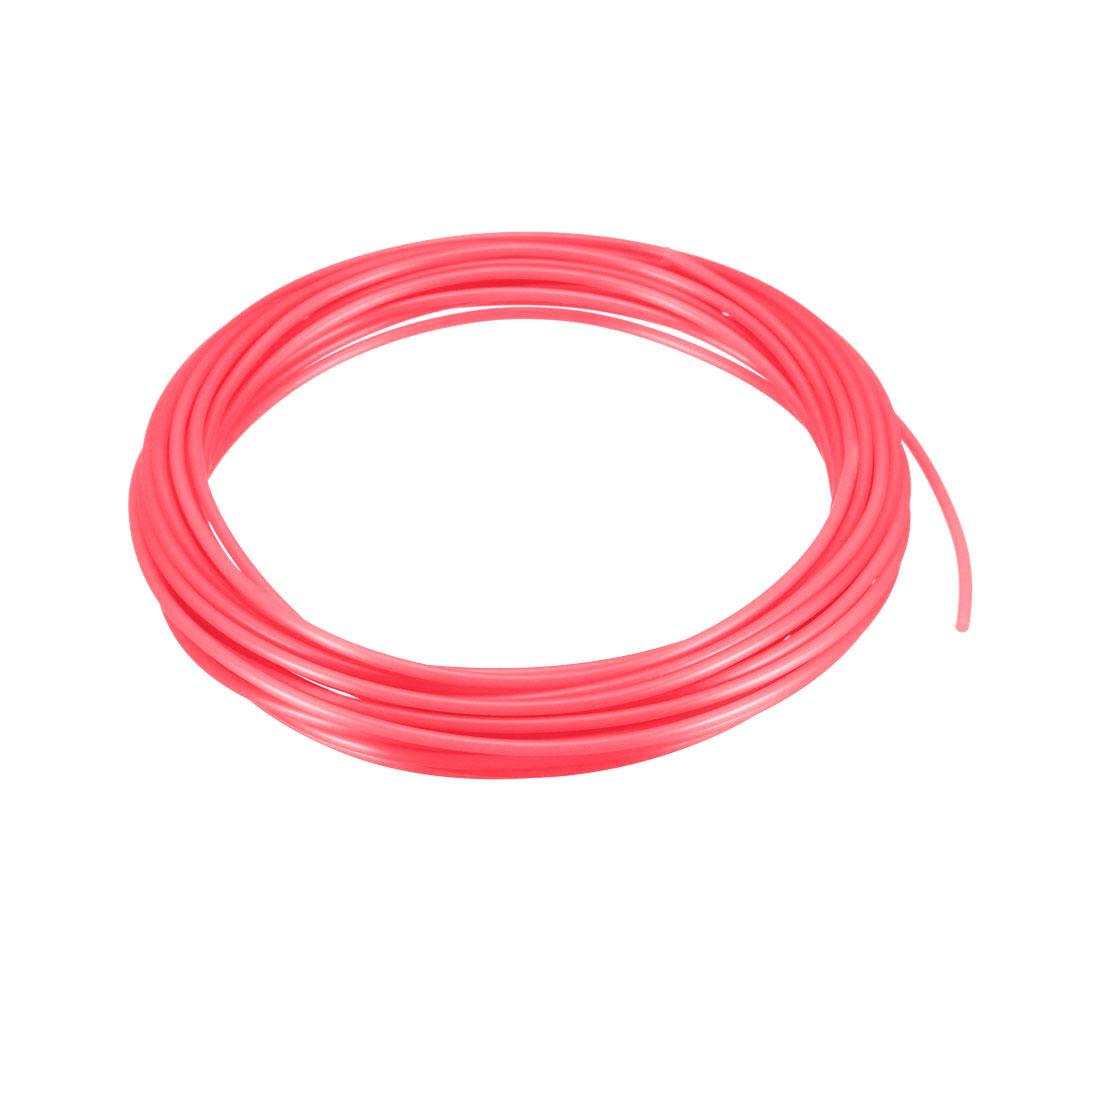 5 Meter/16 Ft PLA 3D Pen/3D Printer Filament, 1.75 mm Luminous Red